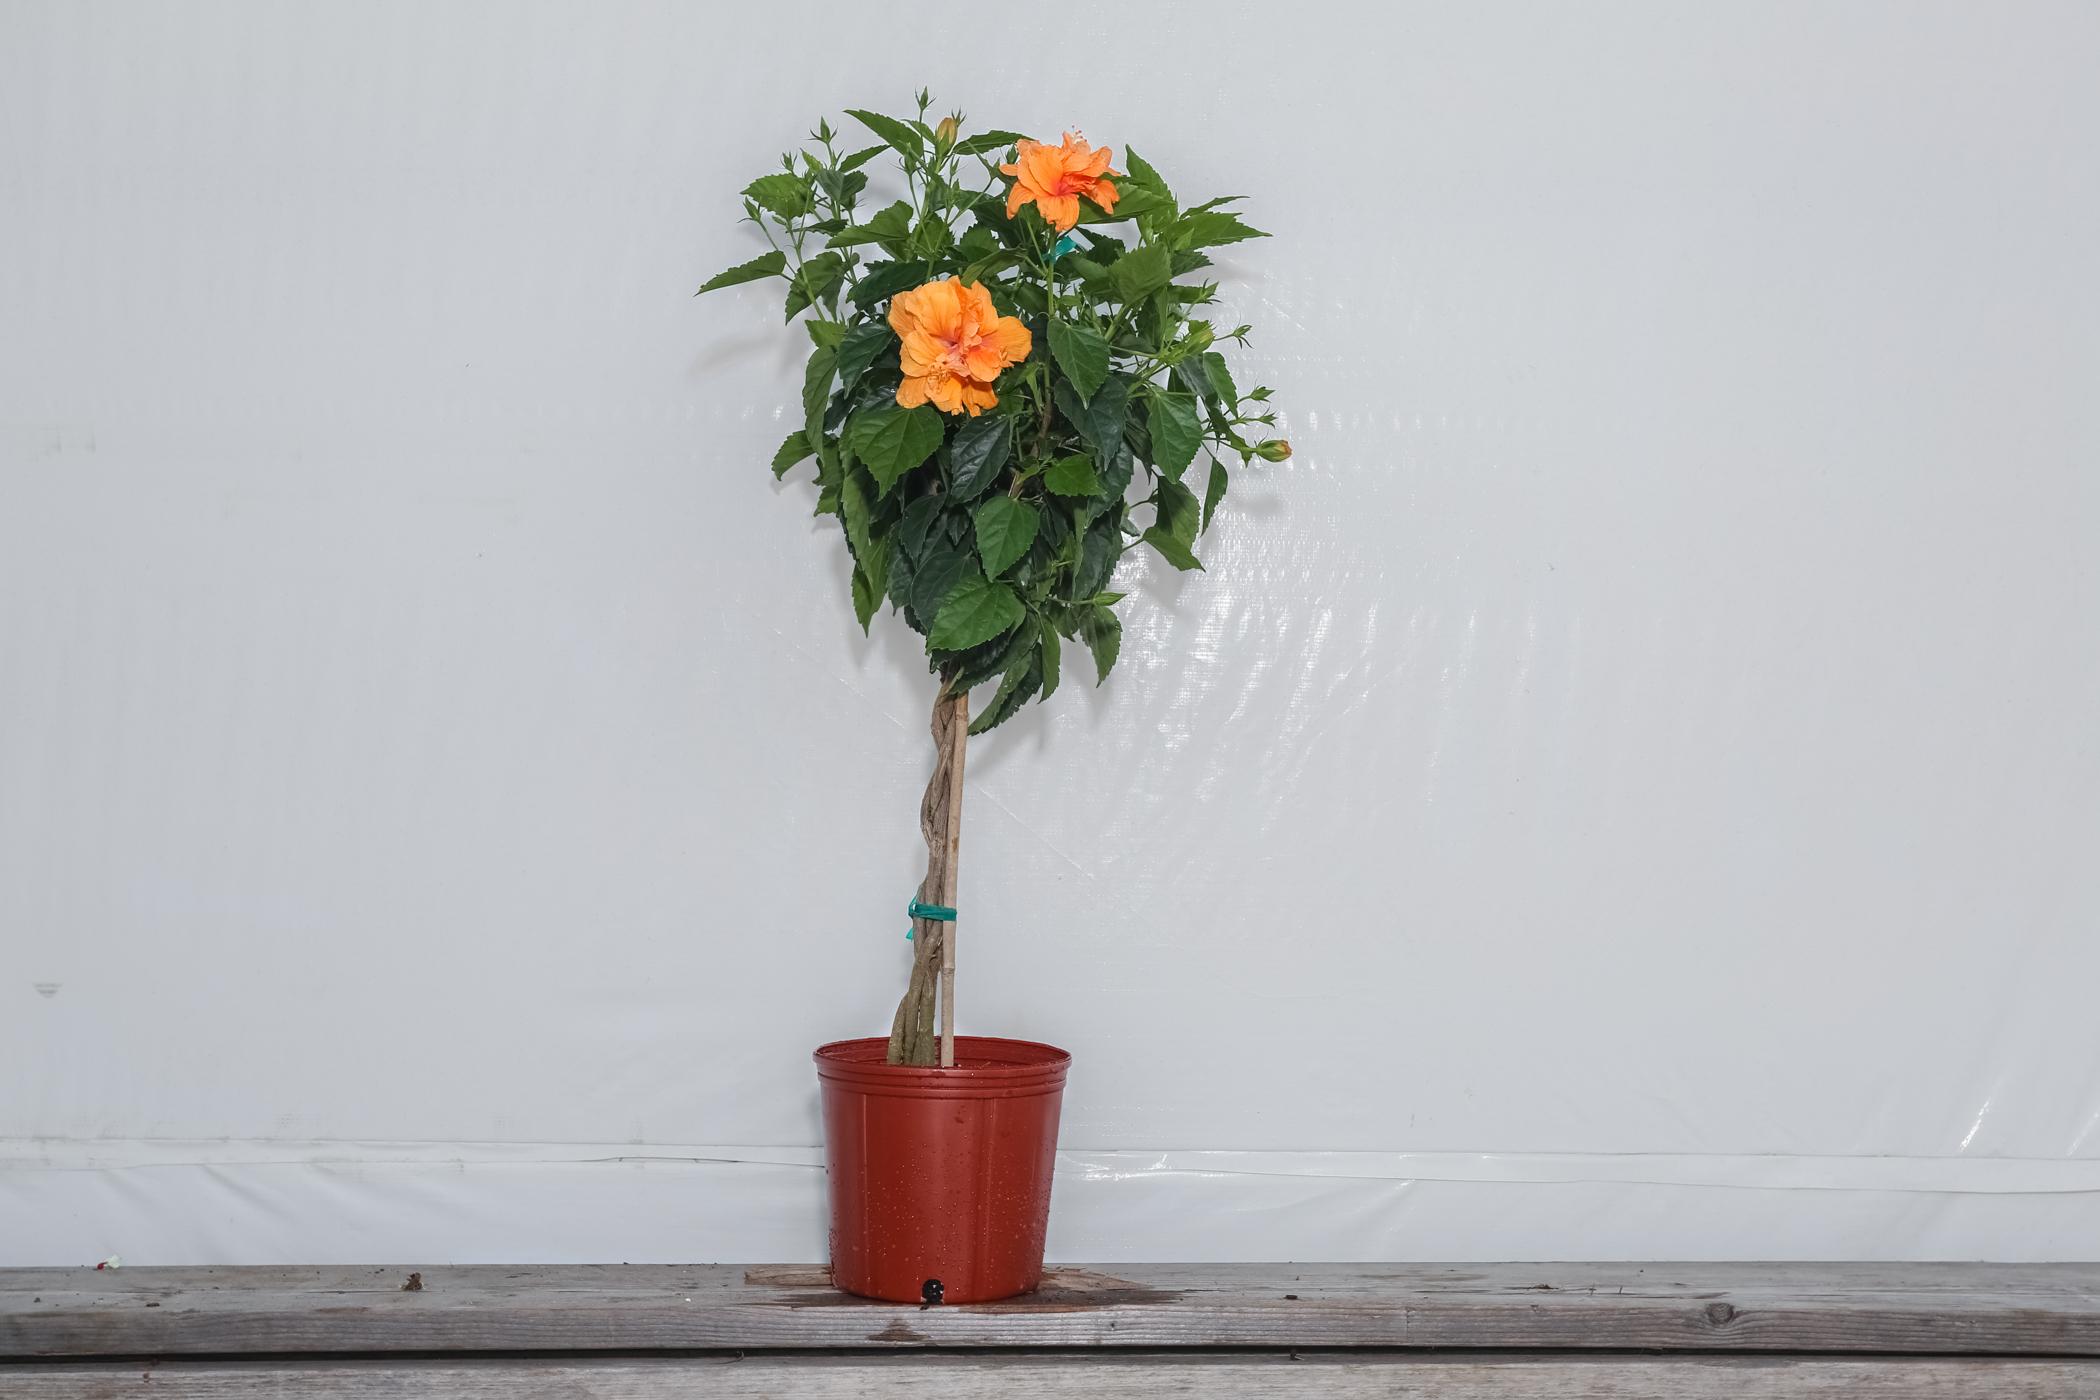 Hibiscus Standard Peach Double Flower Tree 3 Gallon